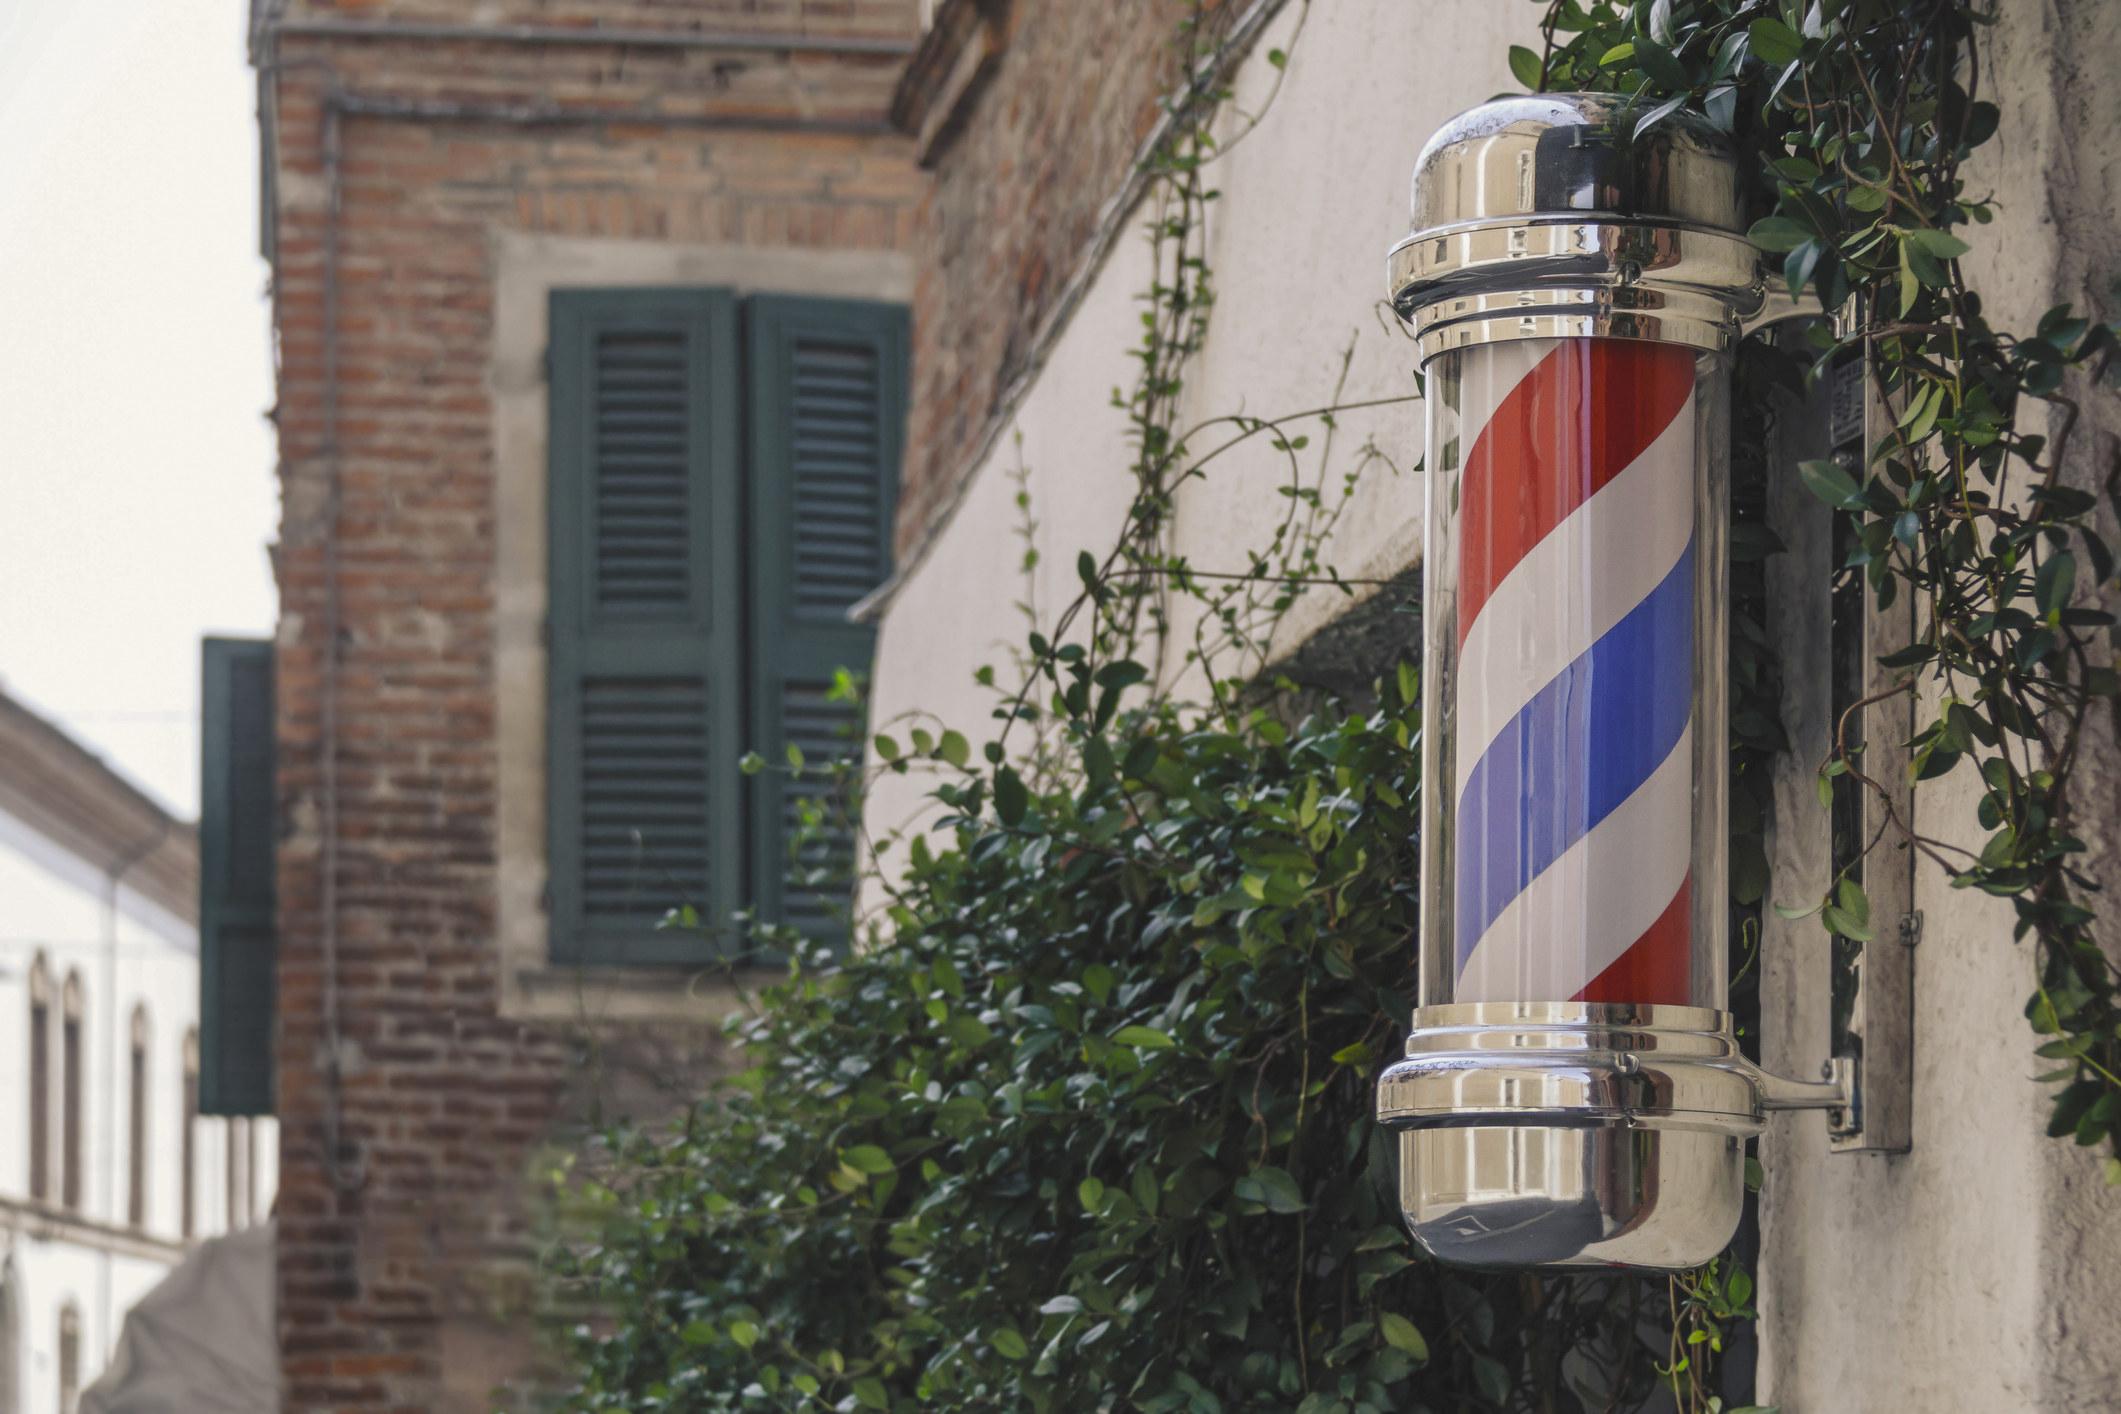 a barber pole